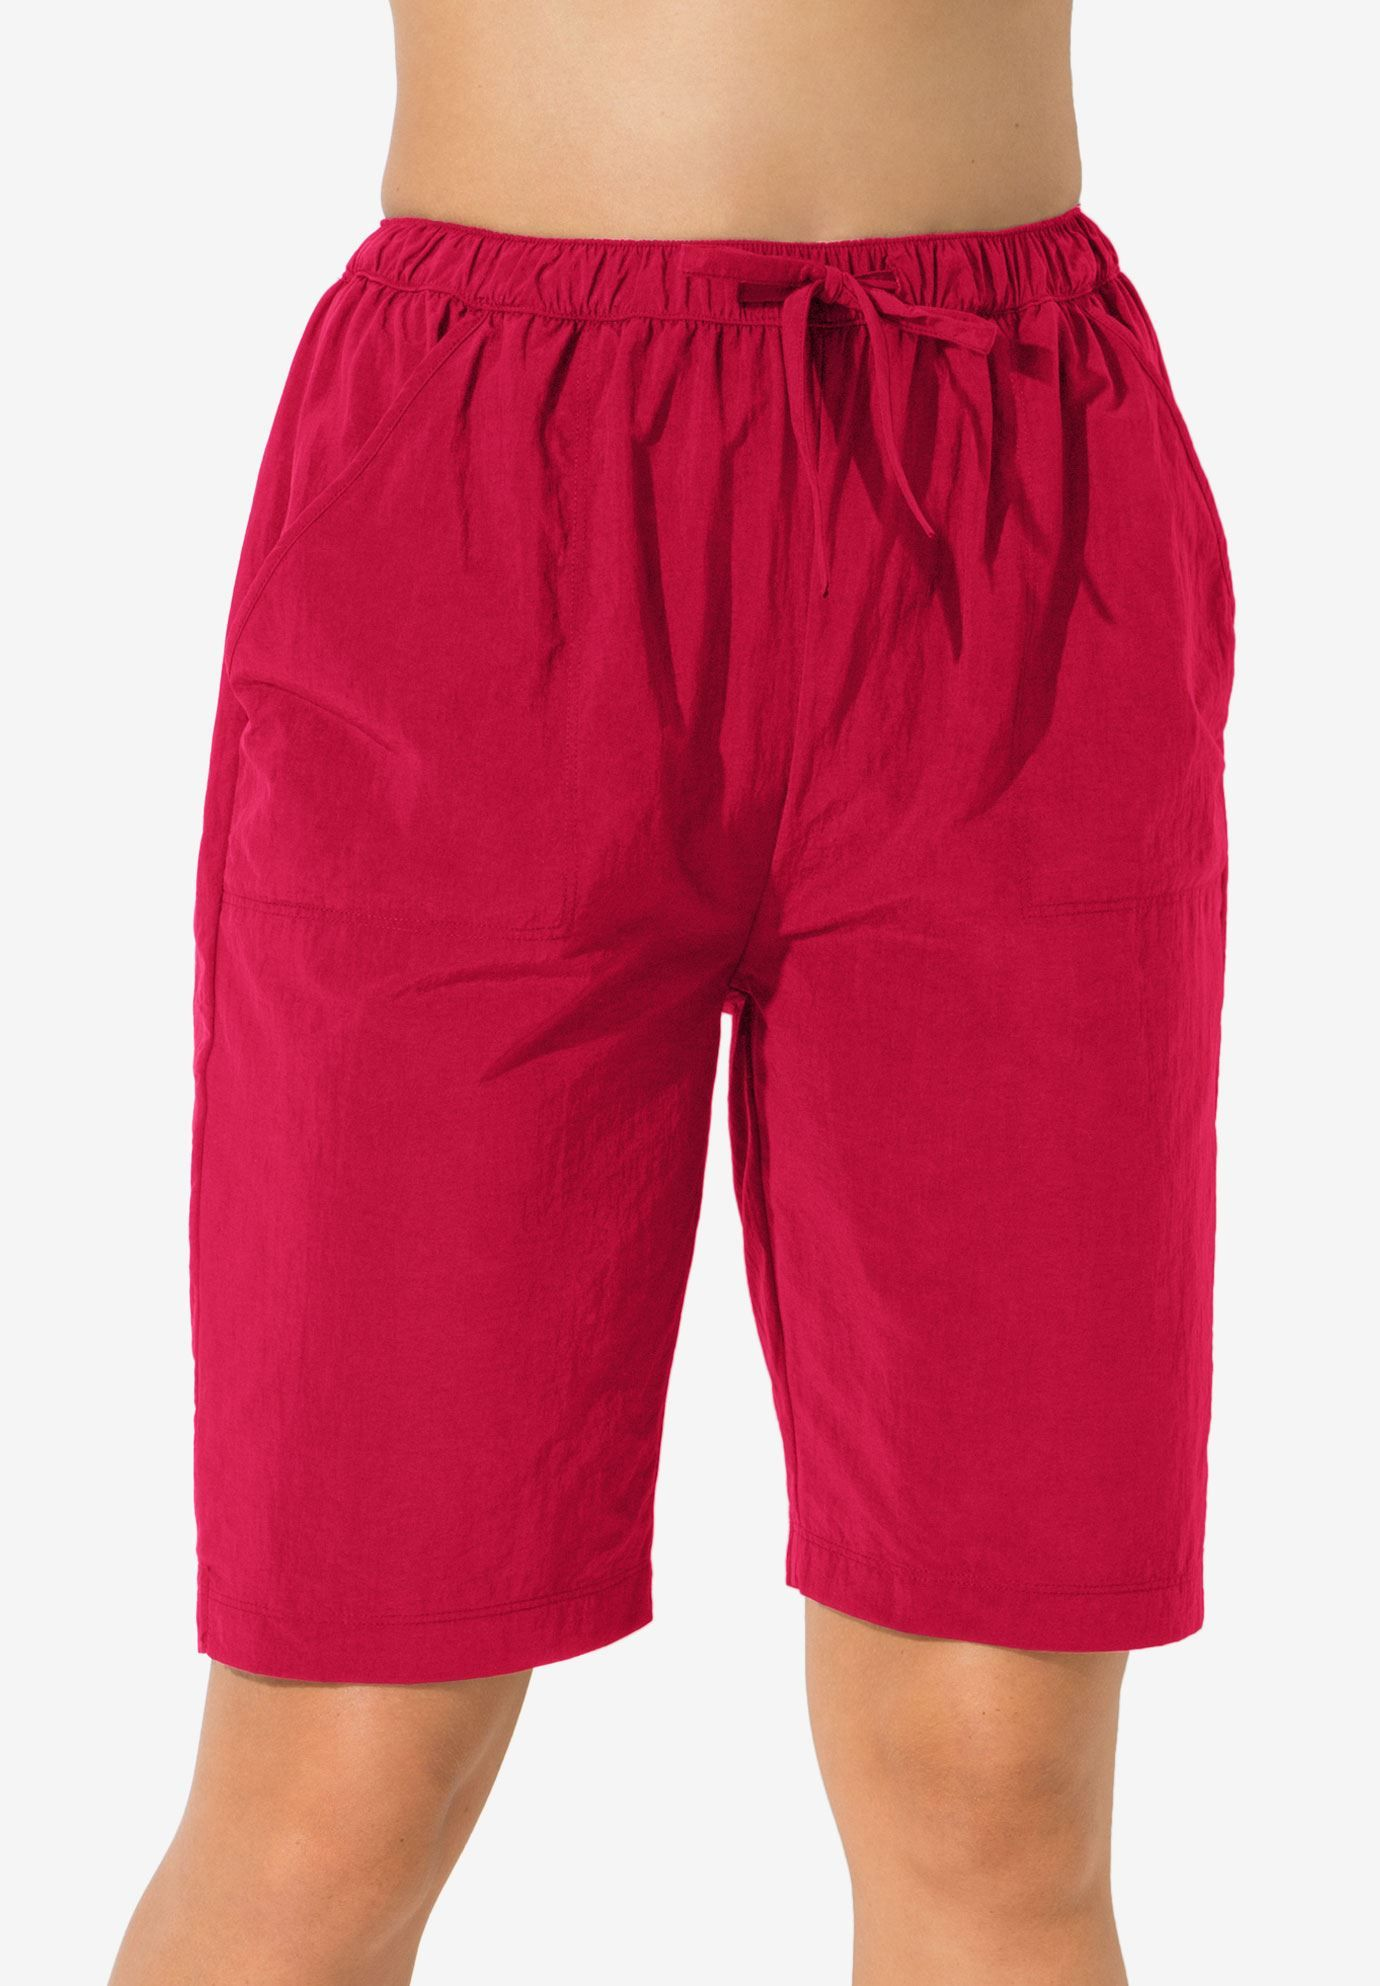 c899230495 Taslon® Swim Board Shorts with Built-In Brief, RED   Dana Ricky ...